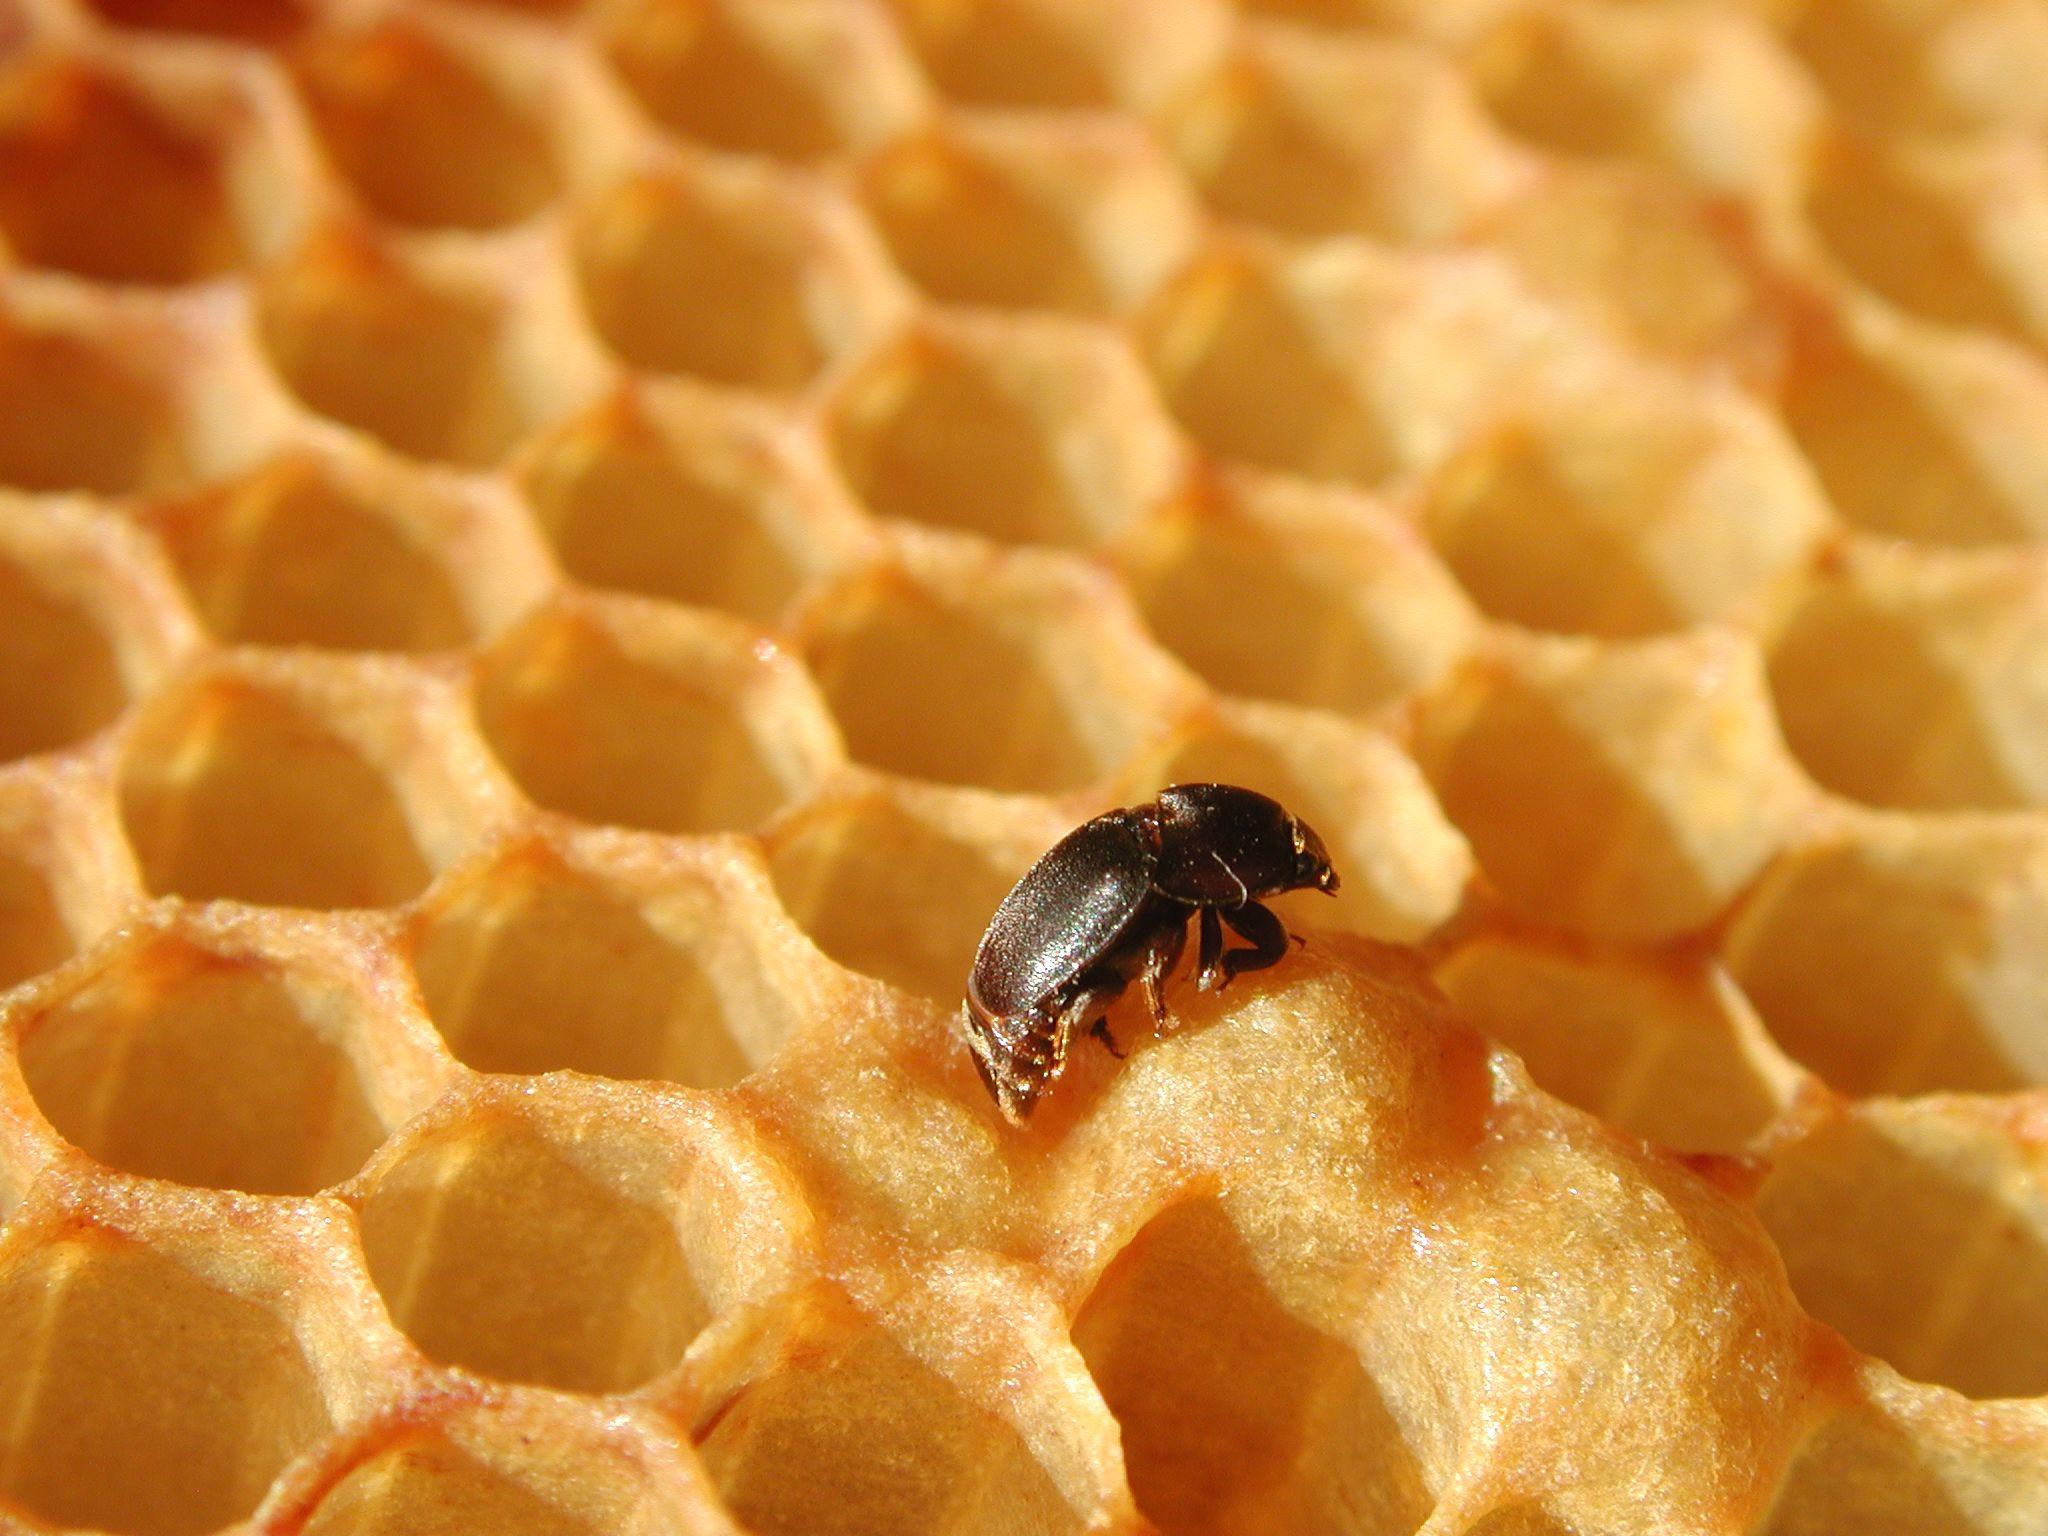 petit coléoptère des ruches, Aethina tumida,